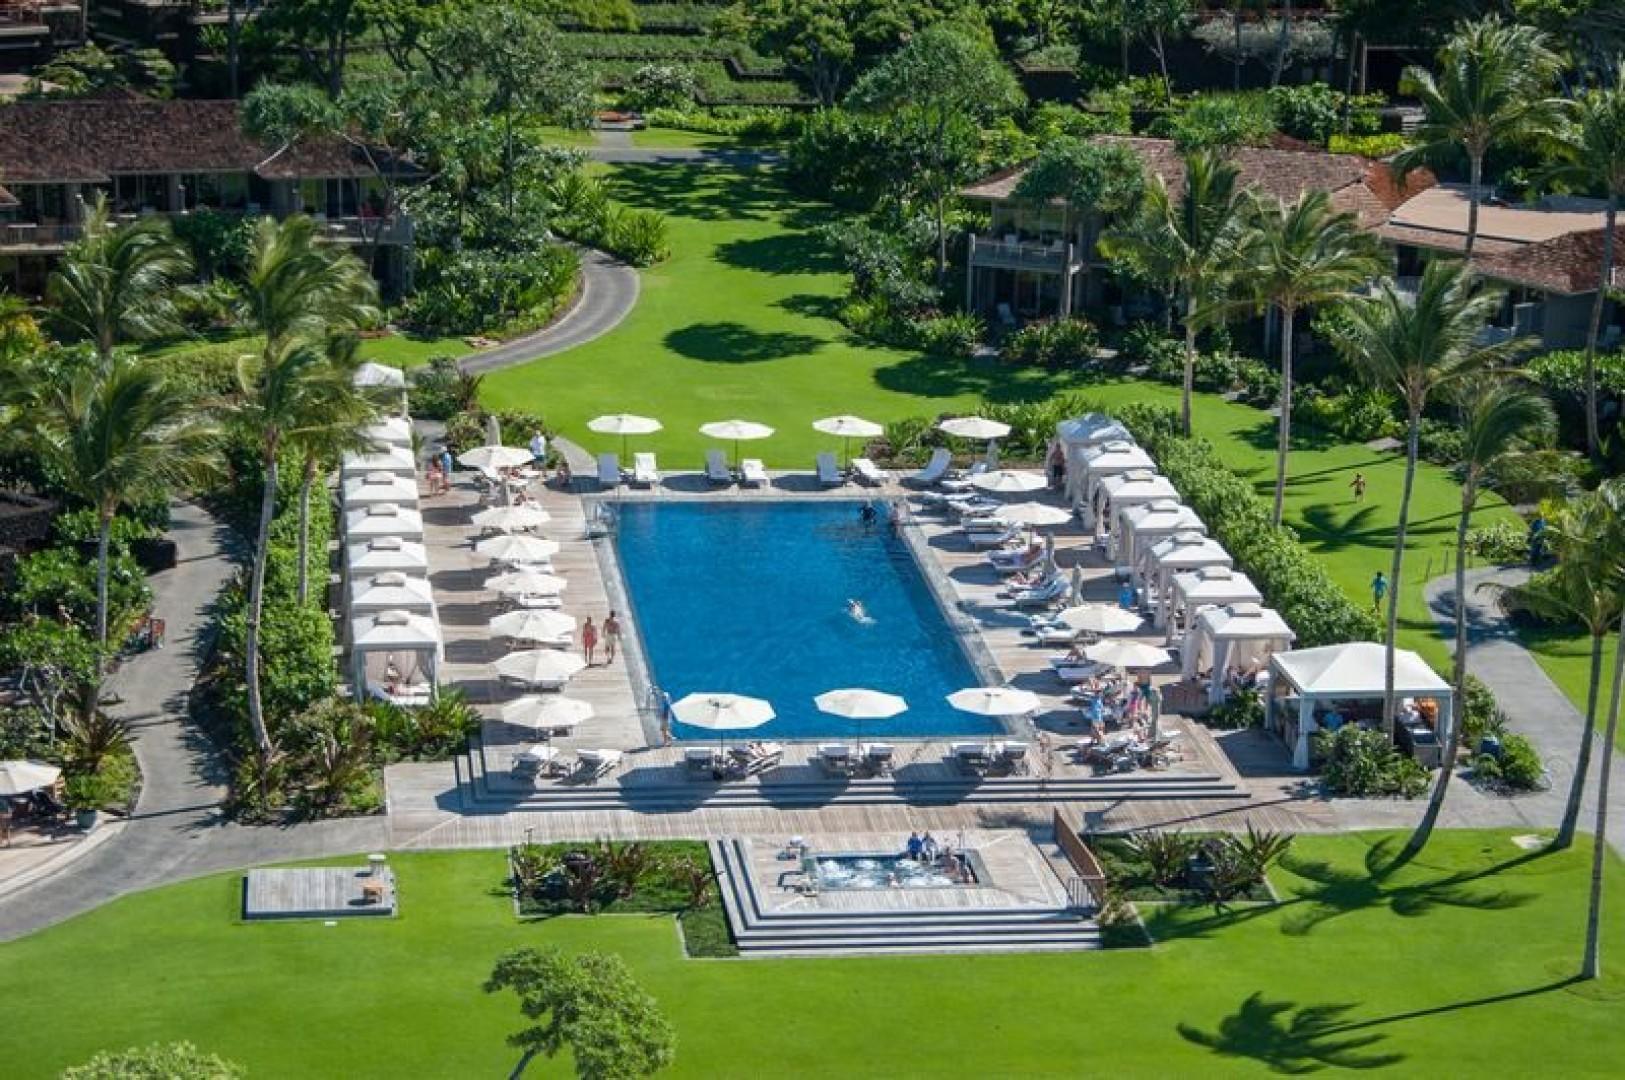 Let your Vacation begin at the Pool at the Four Seasons Resort Hualalai !